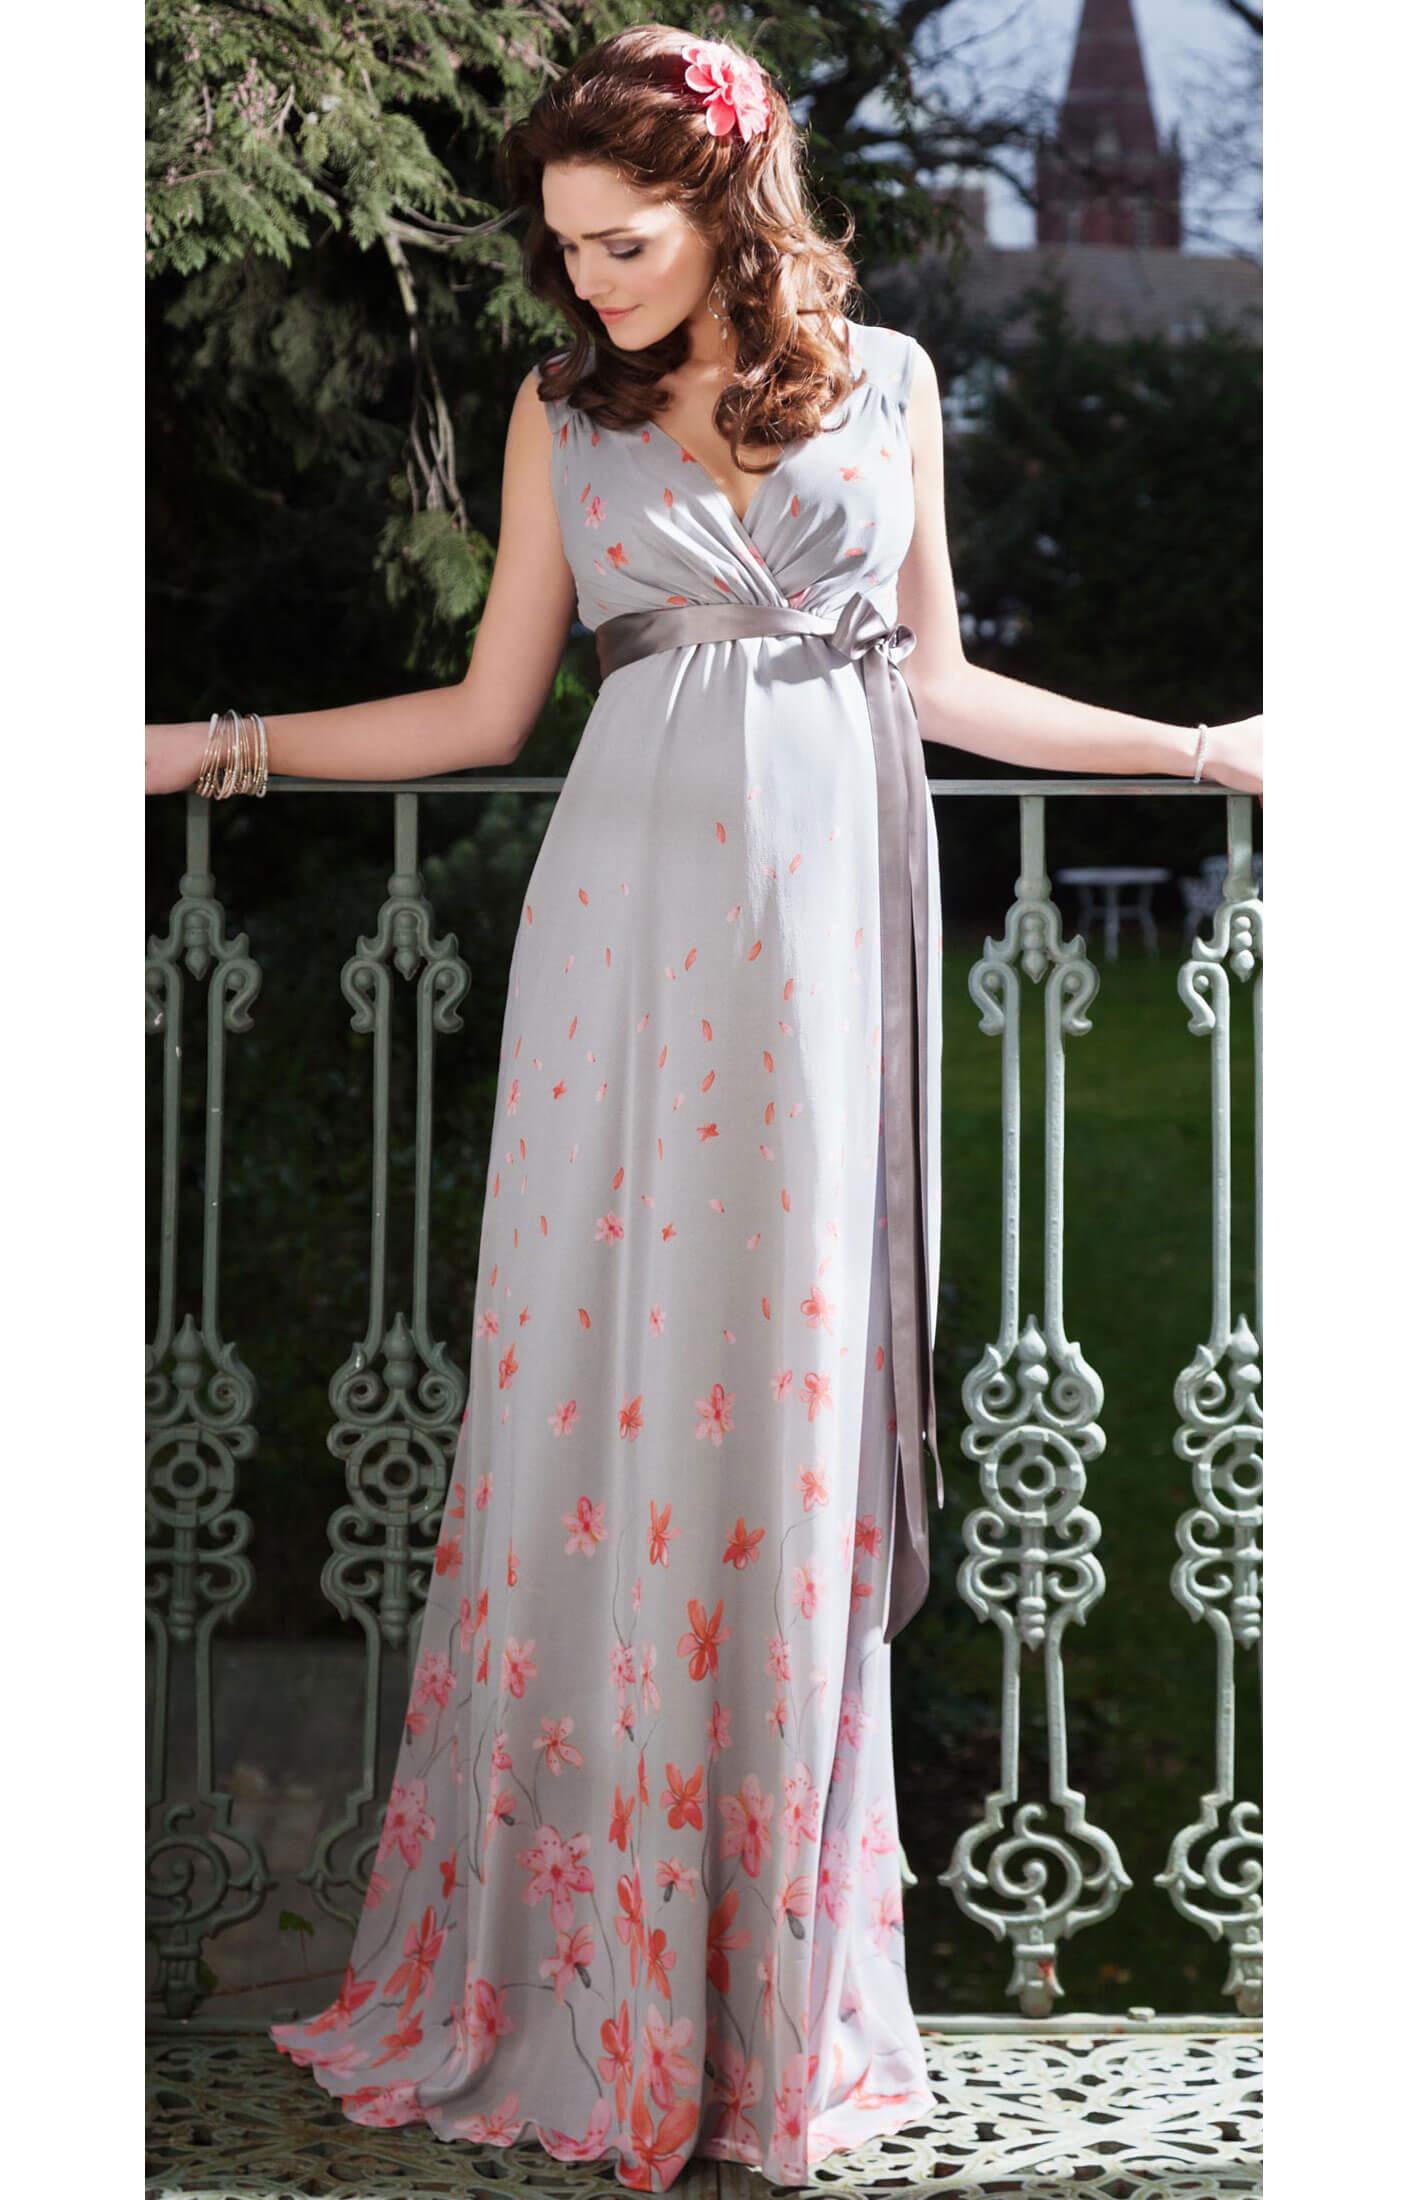 Bien connu Robe de grossesse en soie Jasmine longue (Peach Blossom) - Robes  ZD39